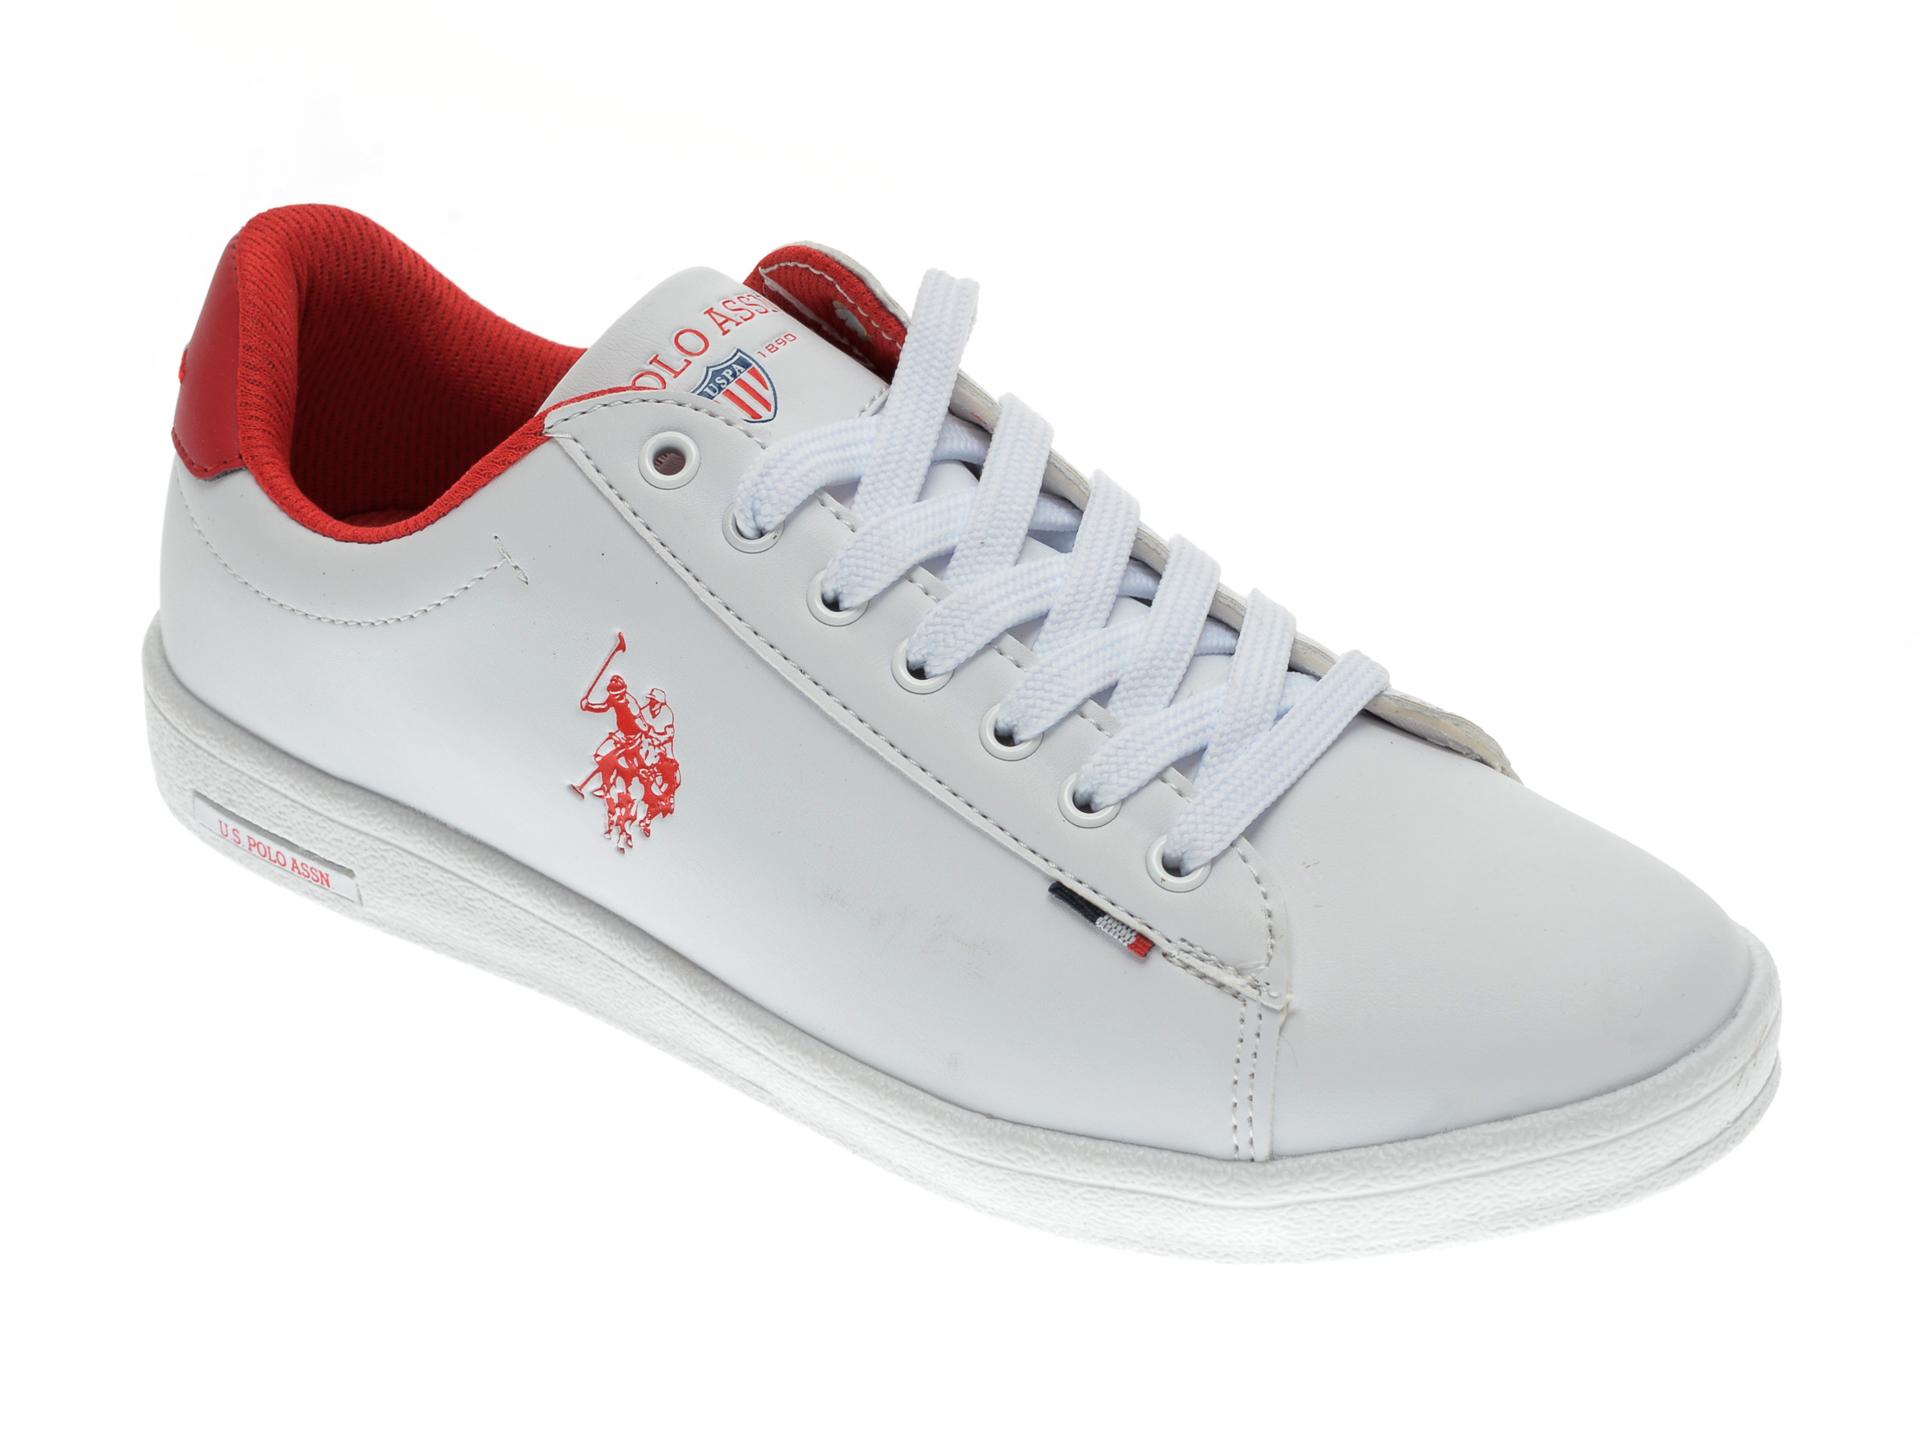 Pantofi sport US POLO ASSN albi, 327264, din piele ecologica New